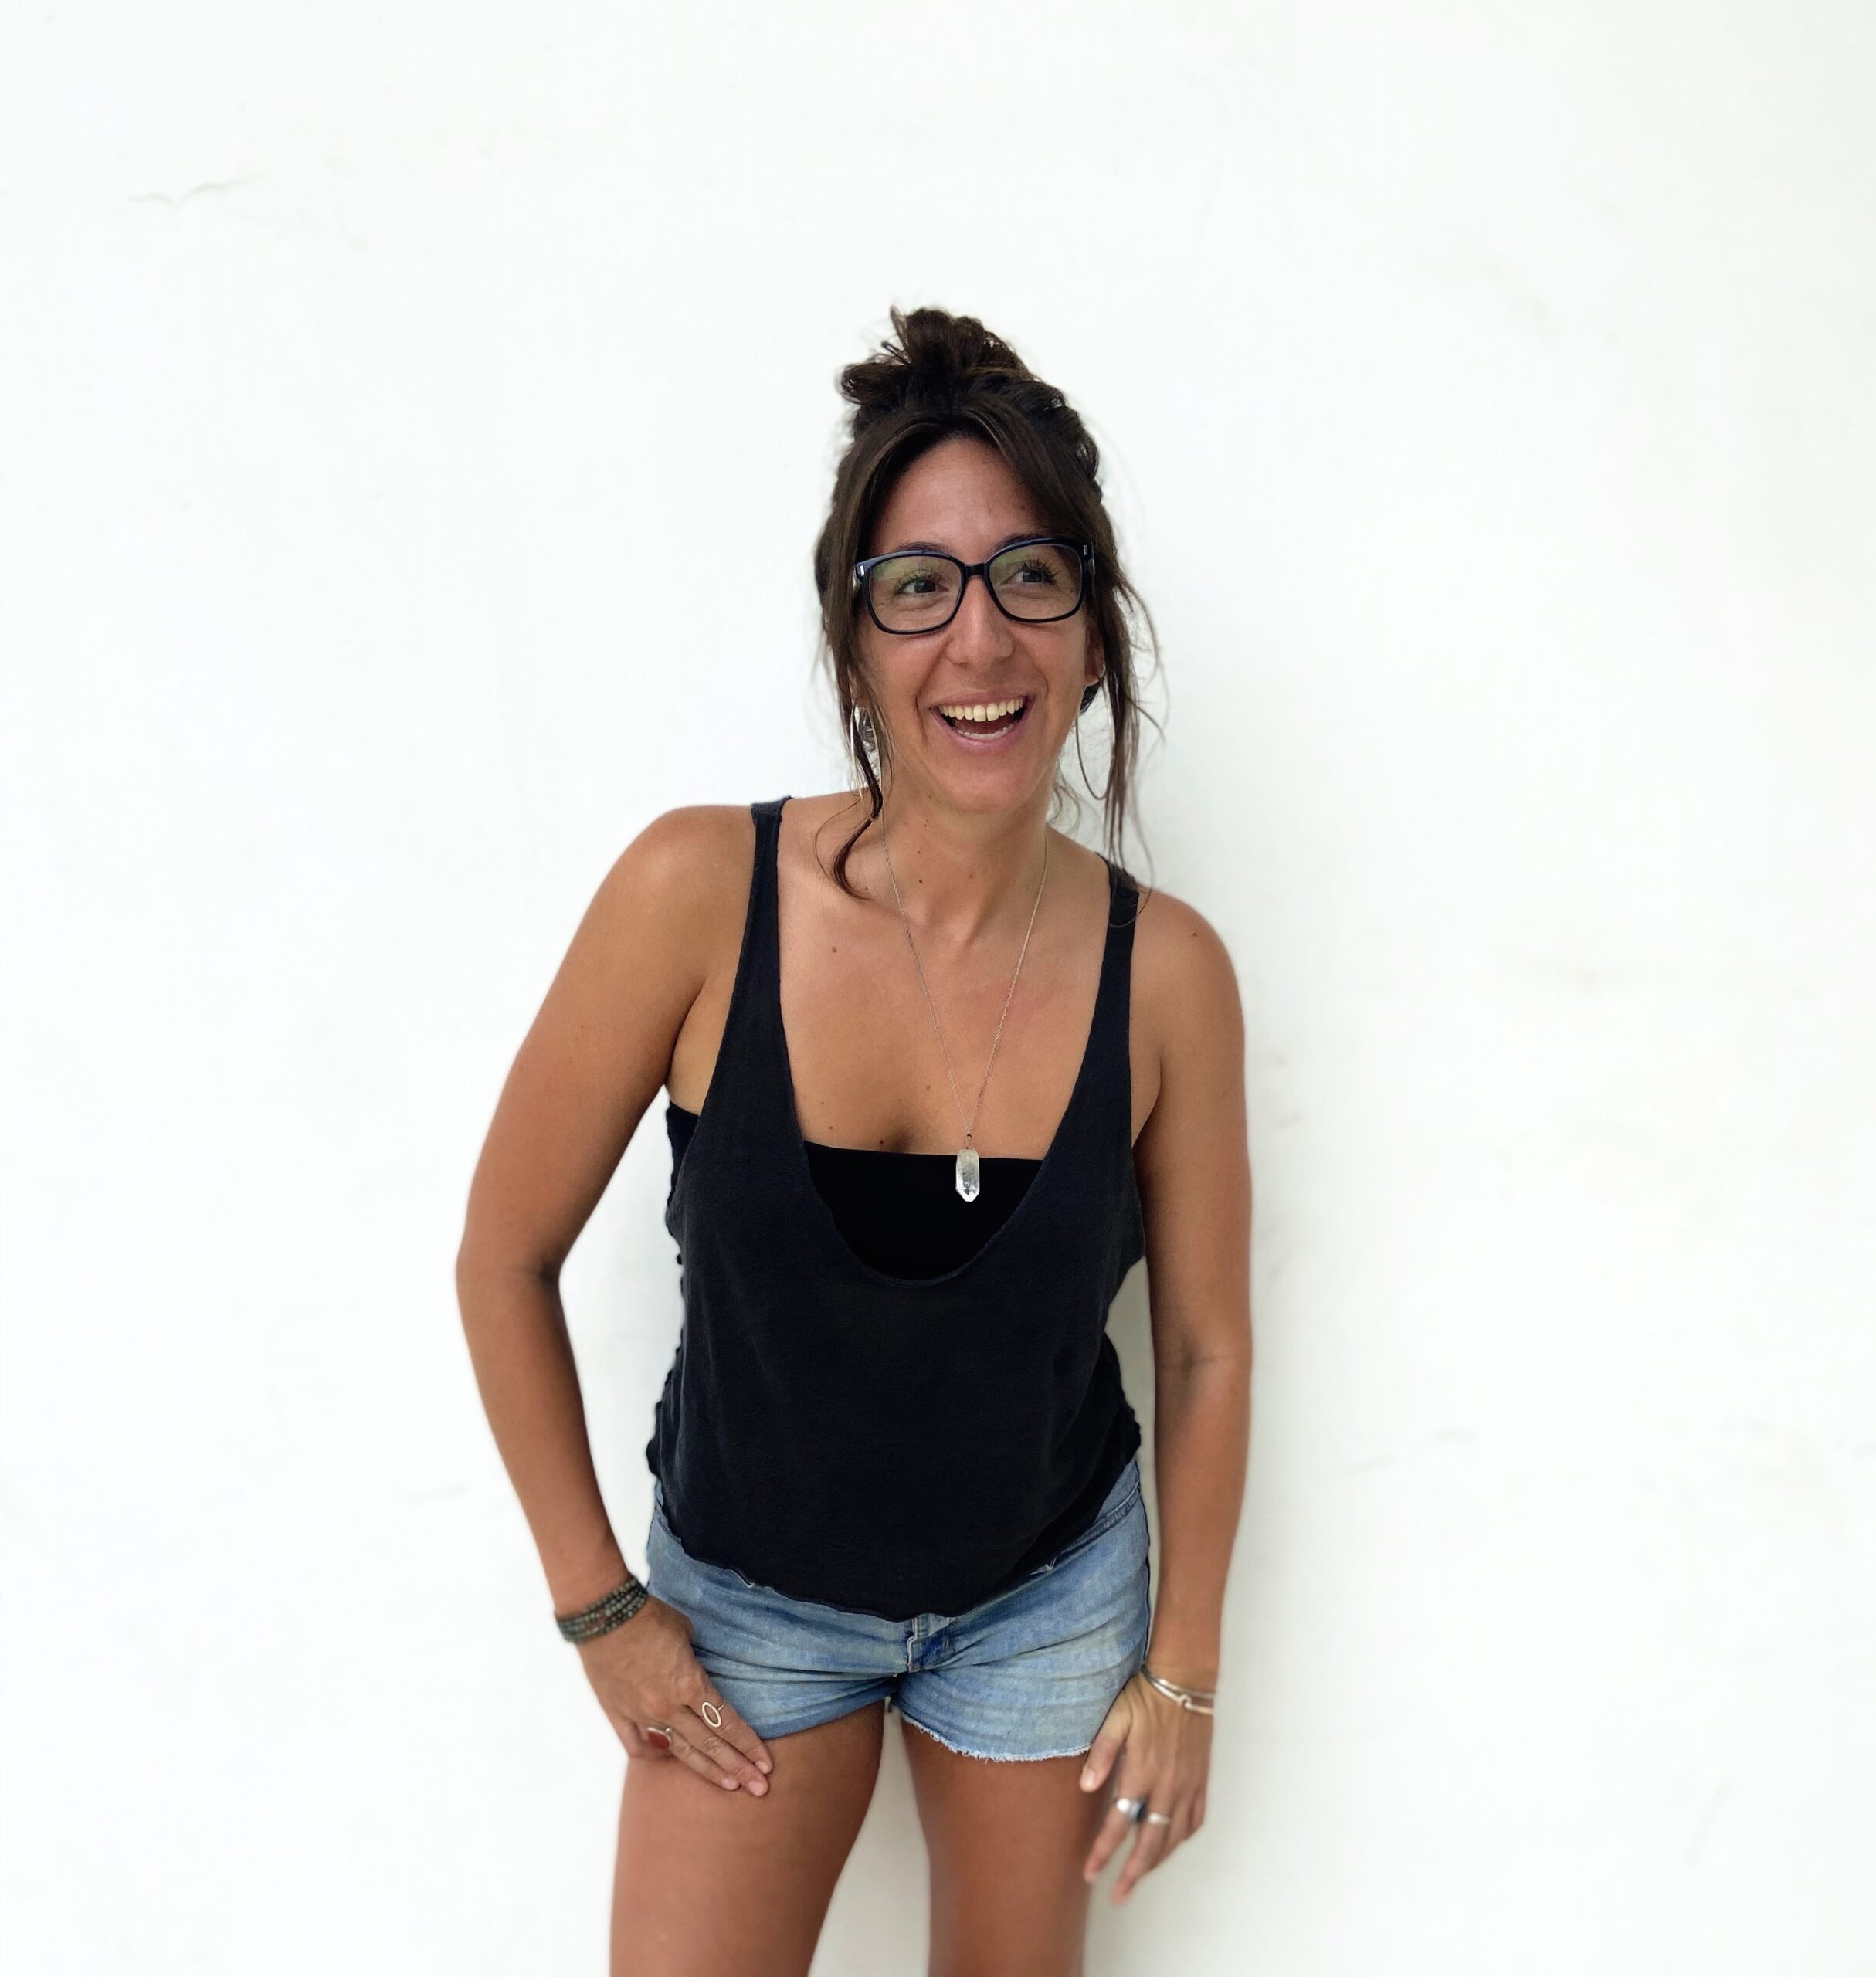 Monique Gomez_laughing1